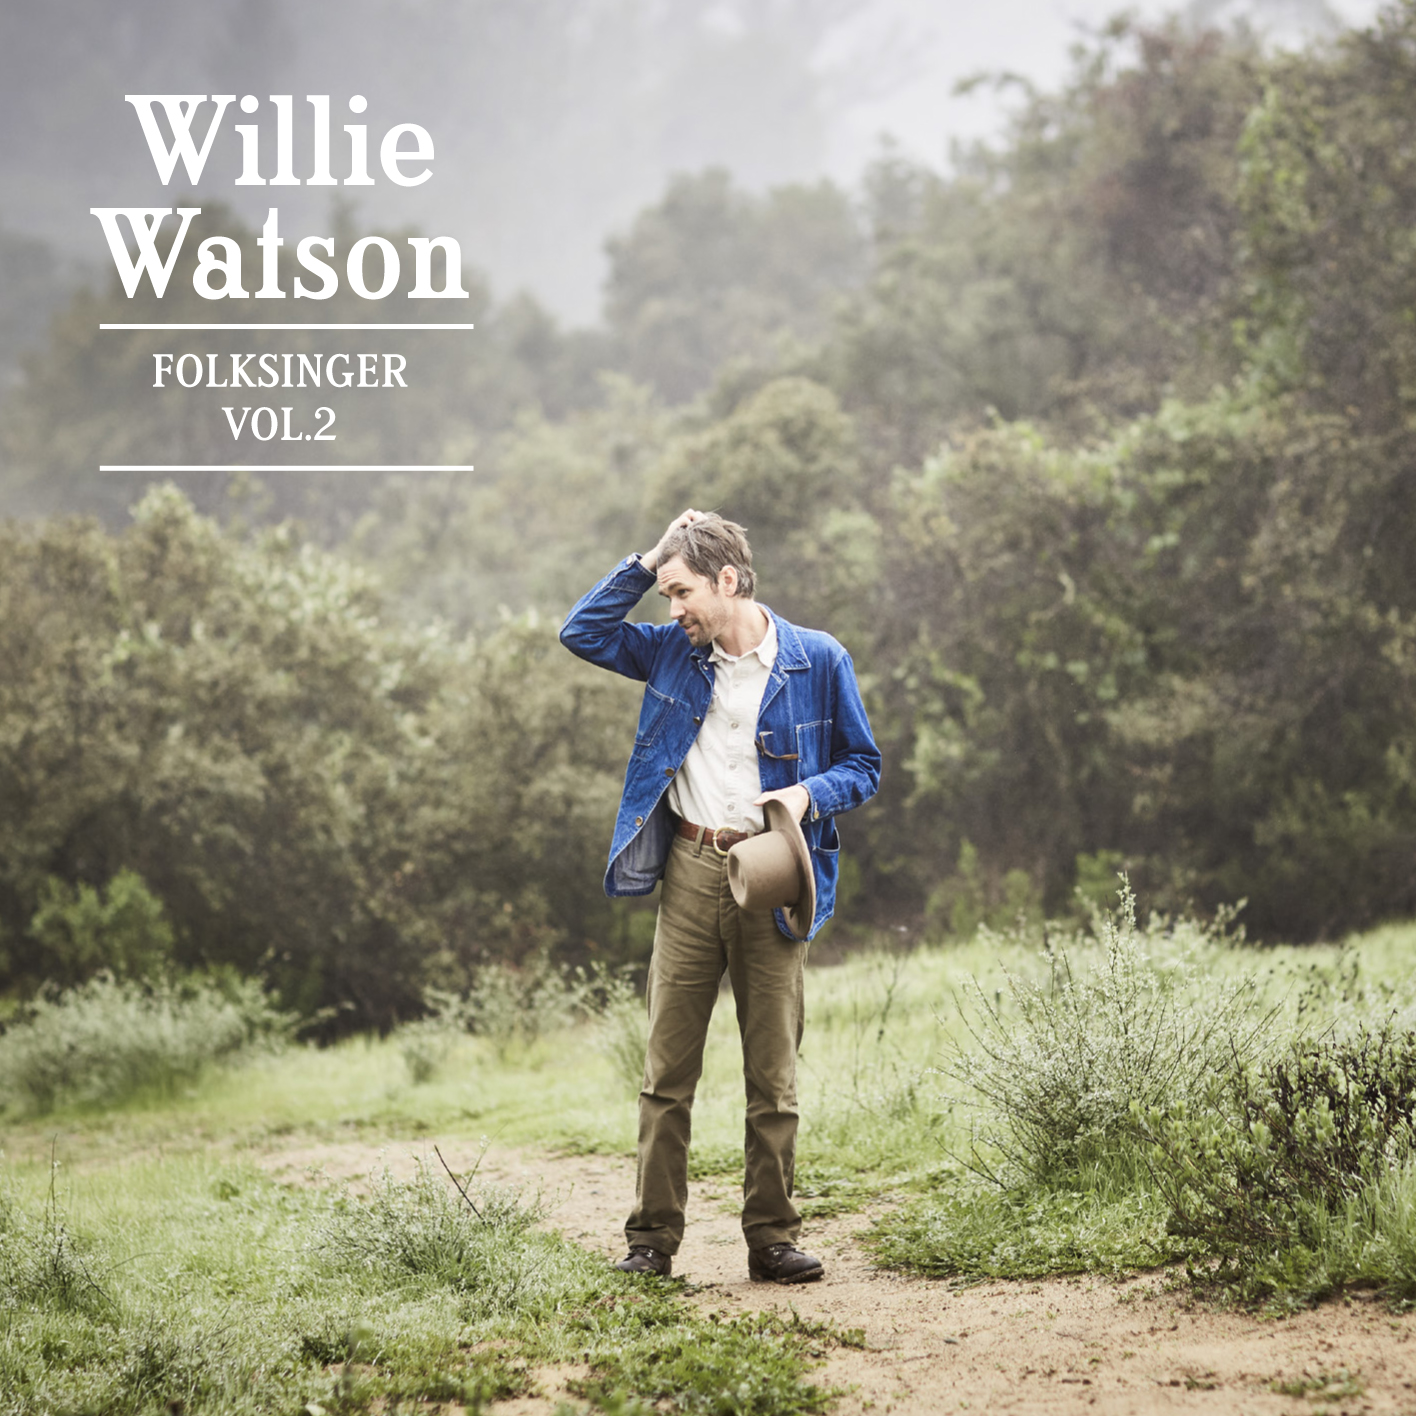 Willie Watson Folksinger Vol. 2